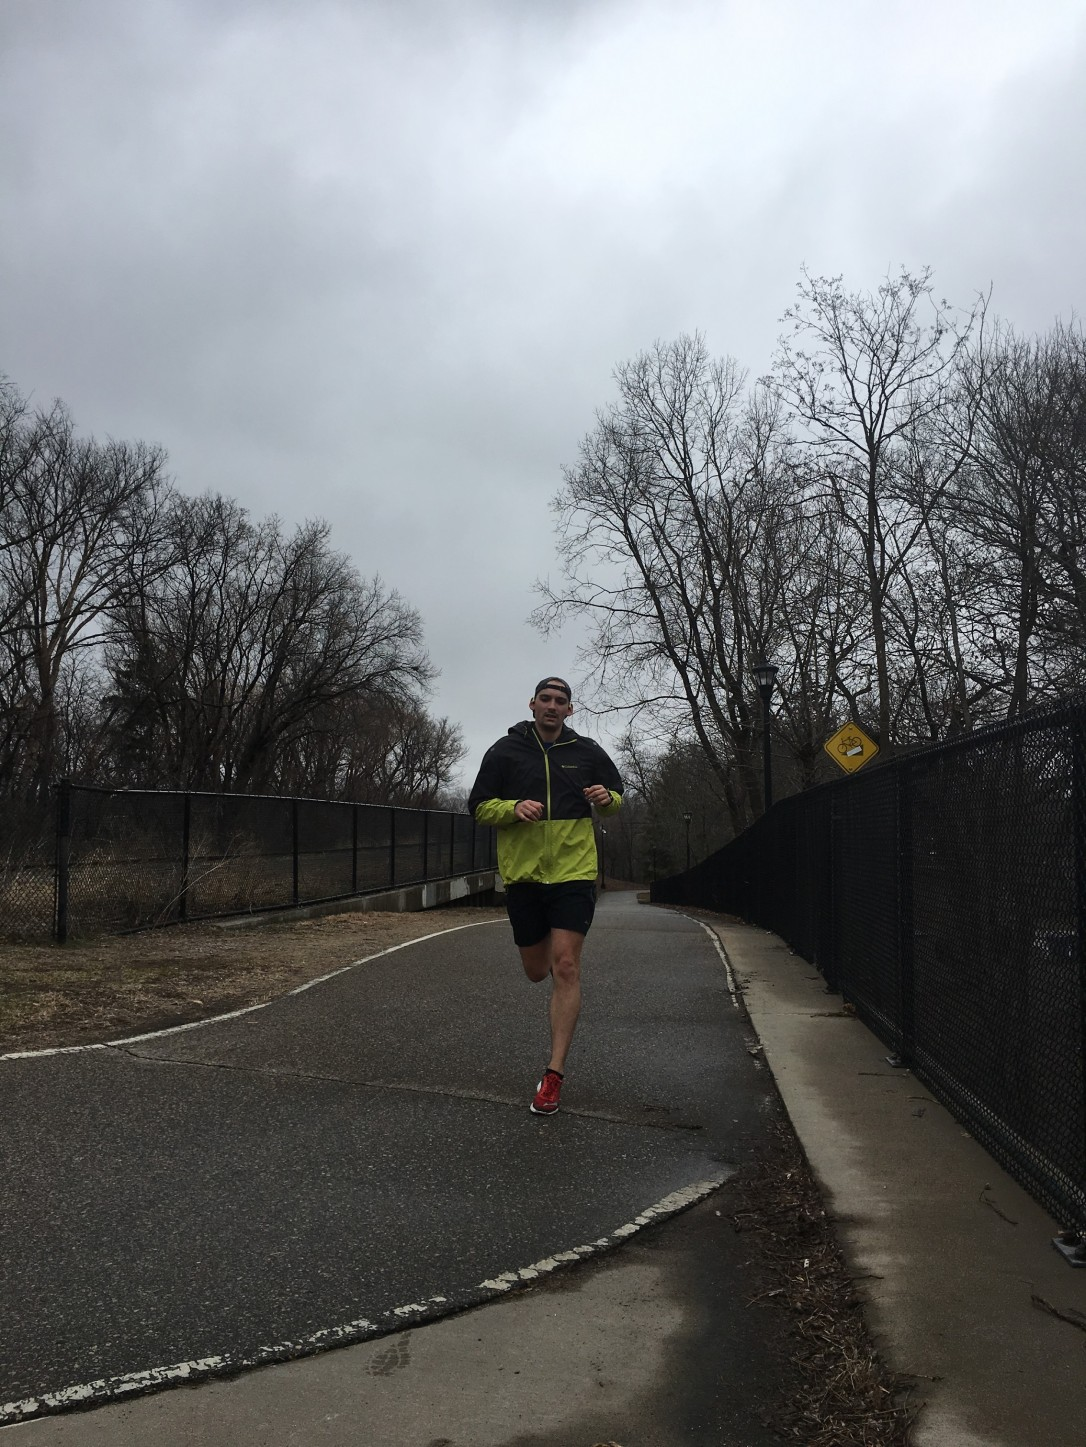 20170328 - Greenway Run